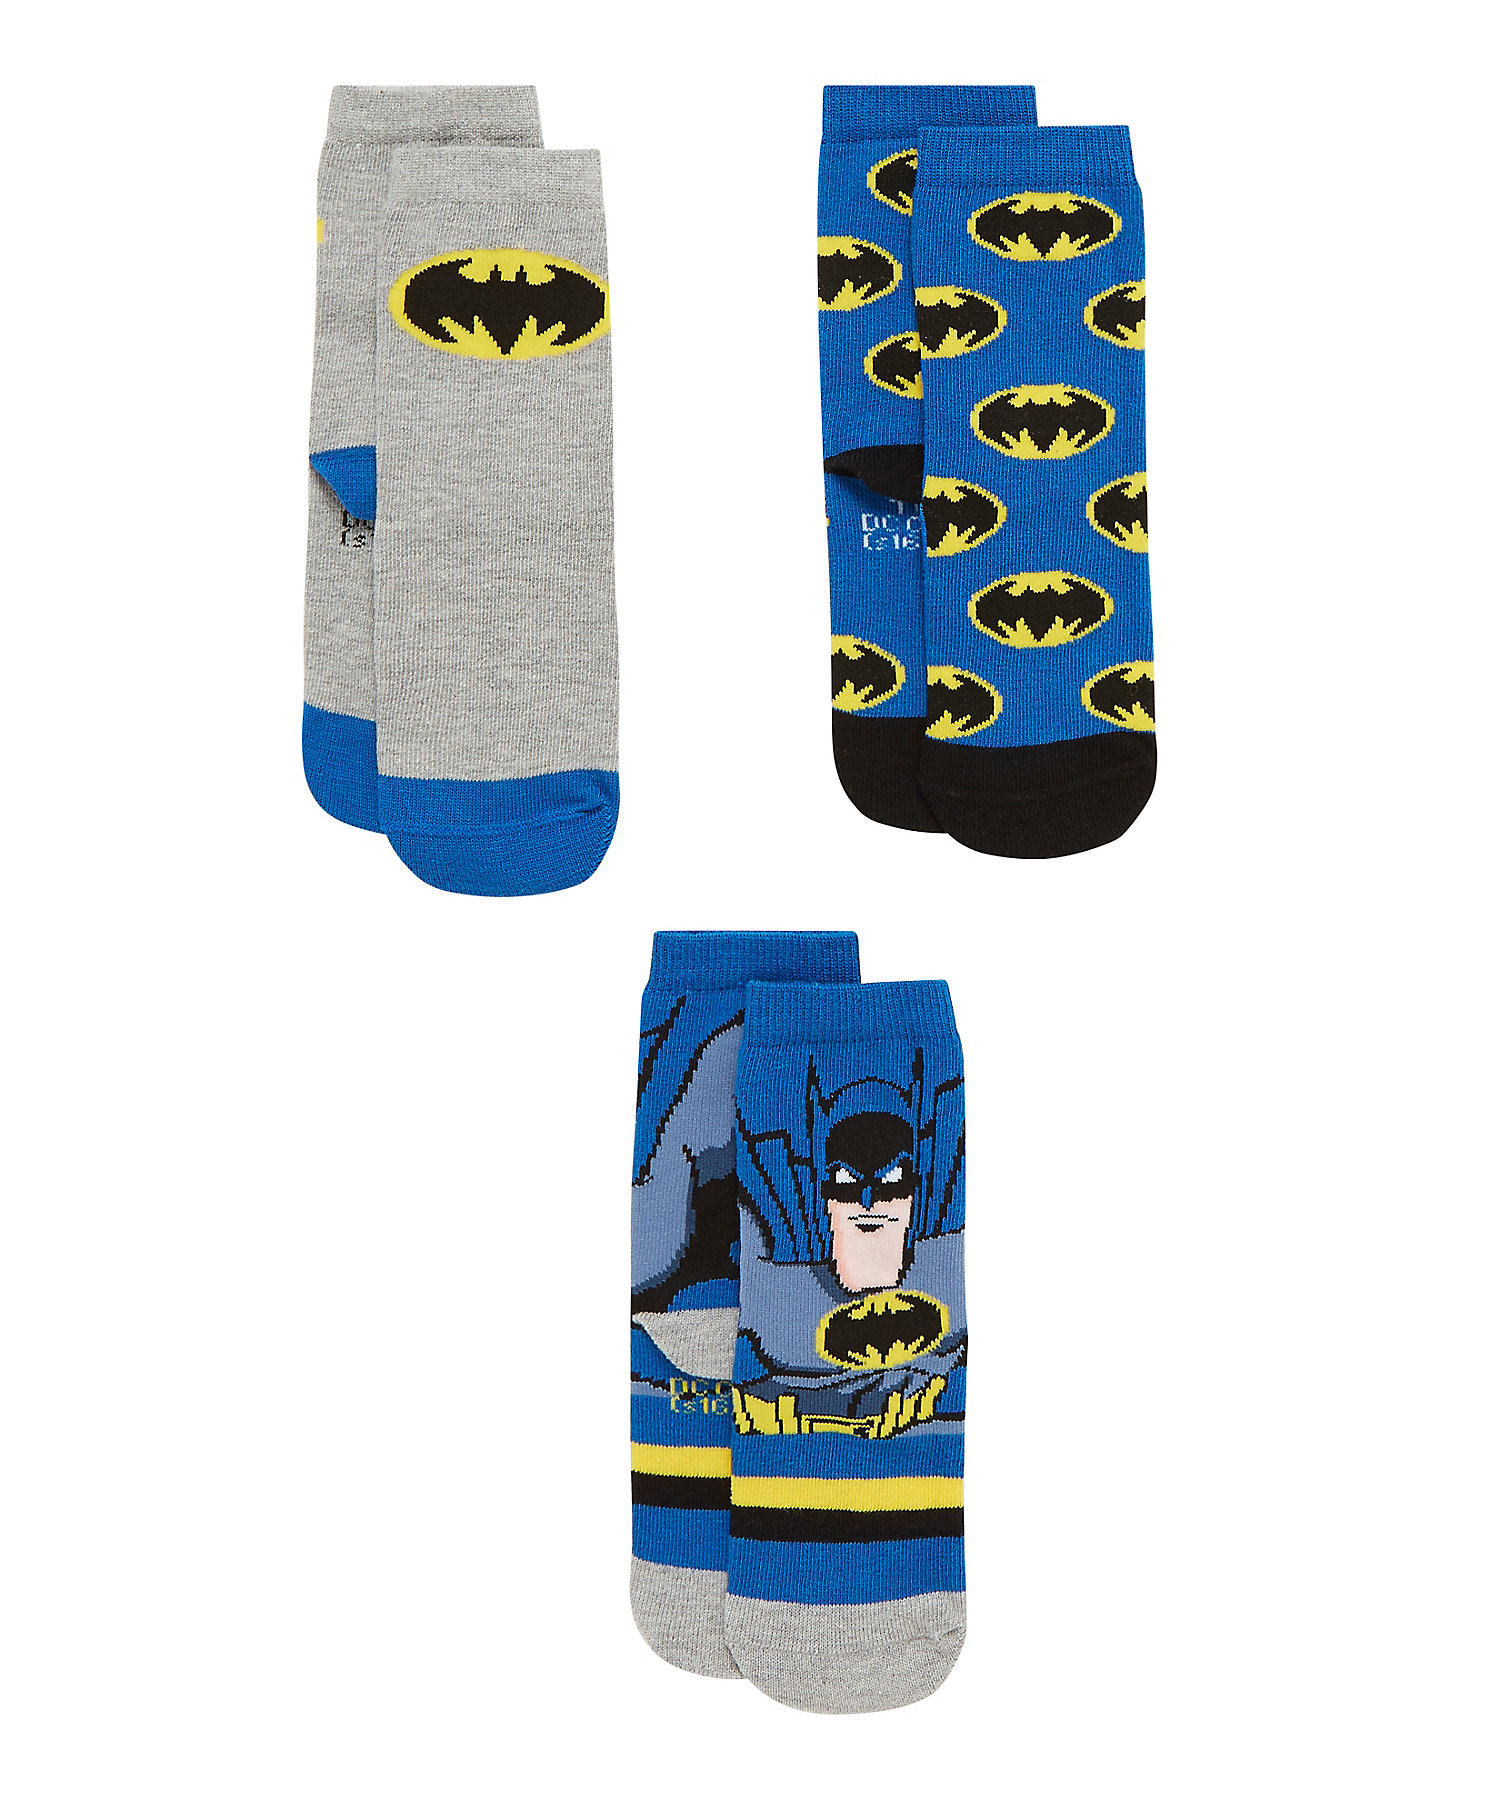 Mothercare   Boys  Socks Batman Design - Pack Of 3 - Multicolor